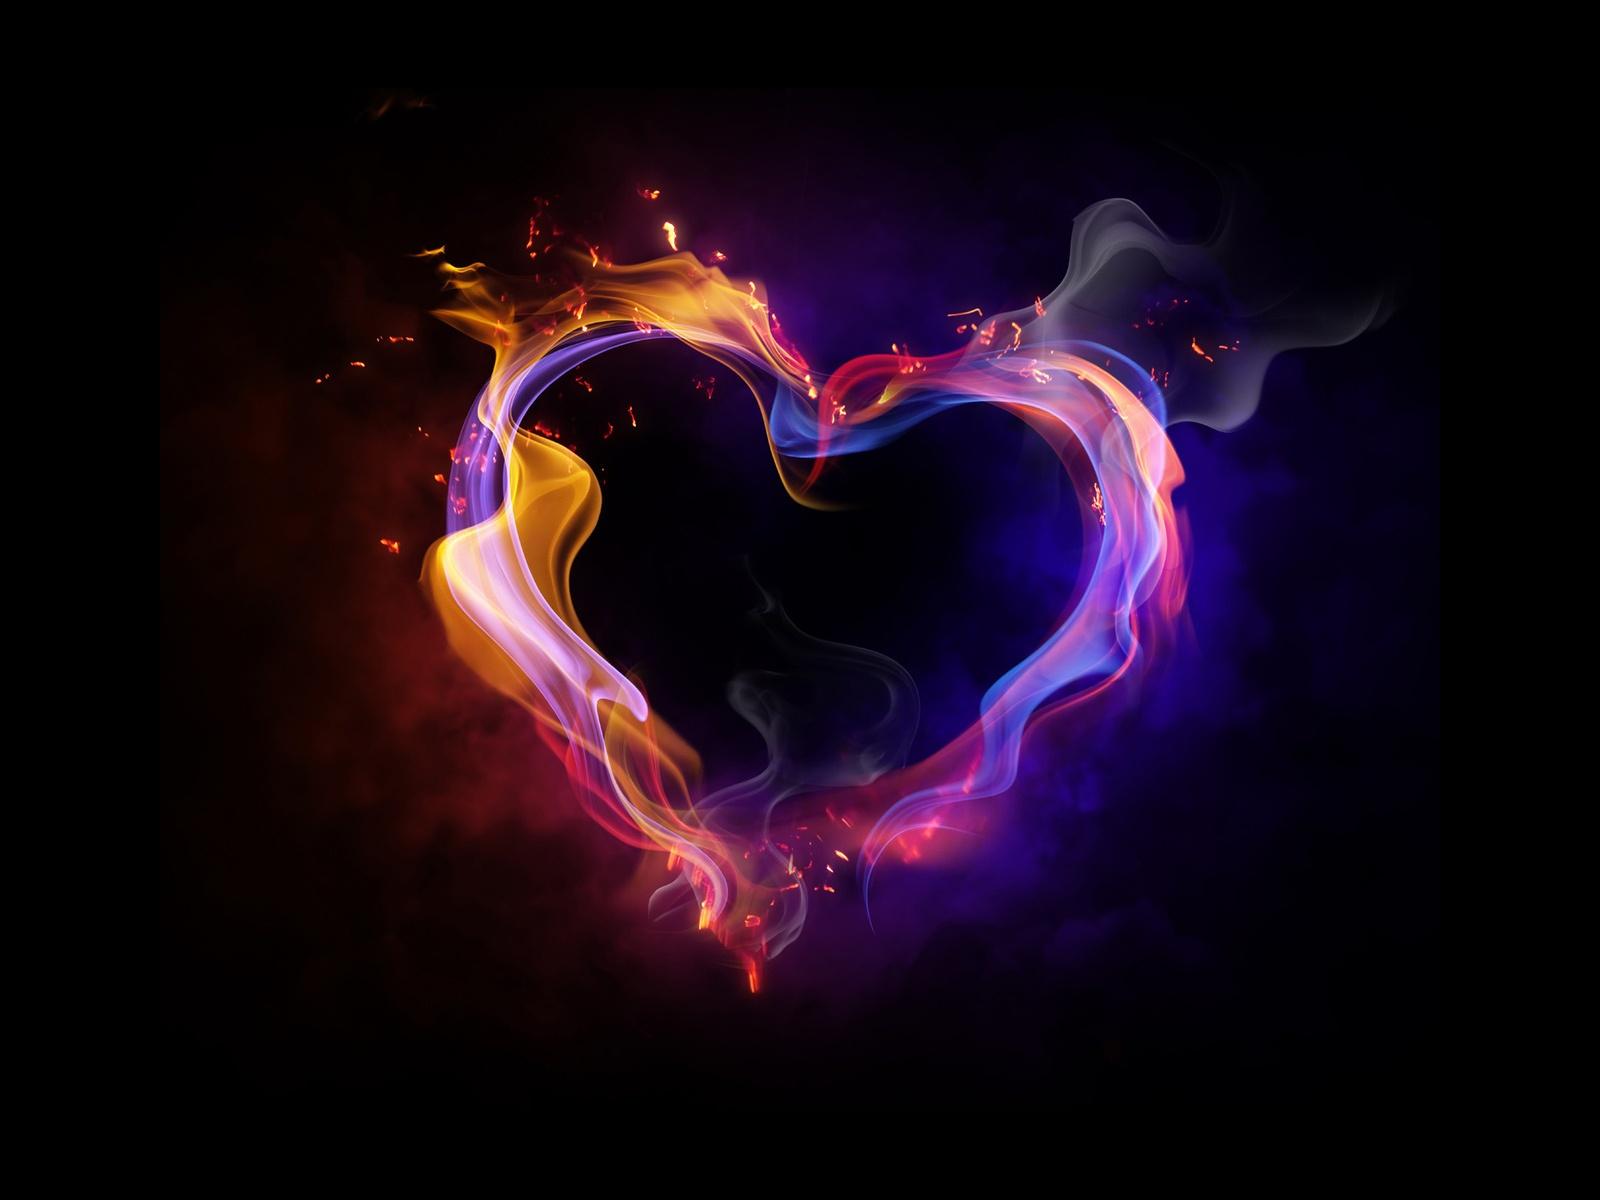 Hd wallpaper of love - Love Heart Full Hd Wallpaper 2015 13556 Wallpaper Computer Best